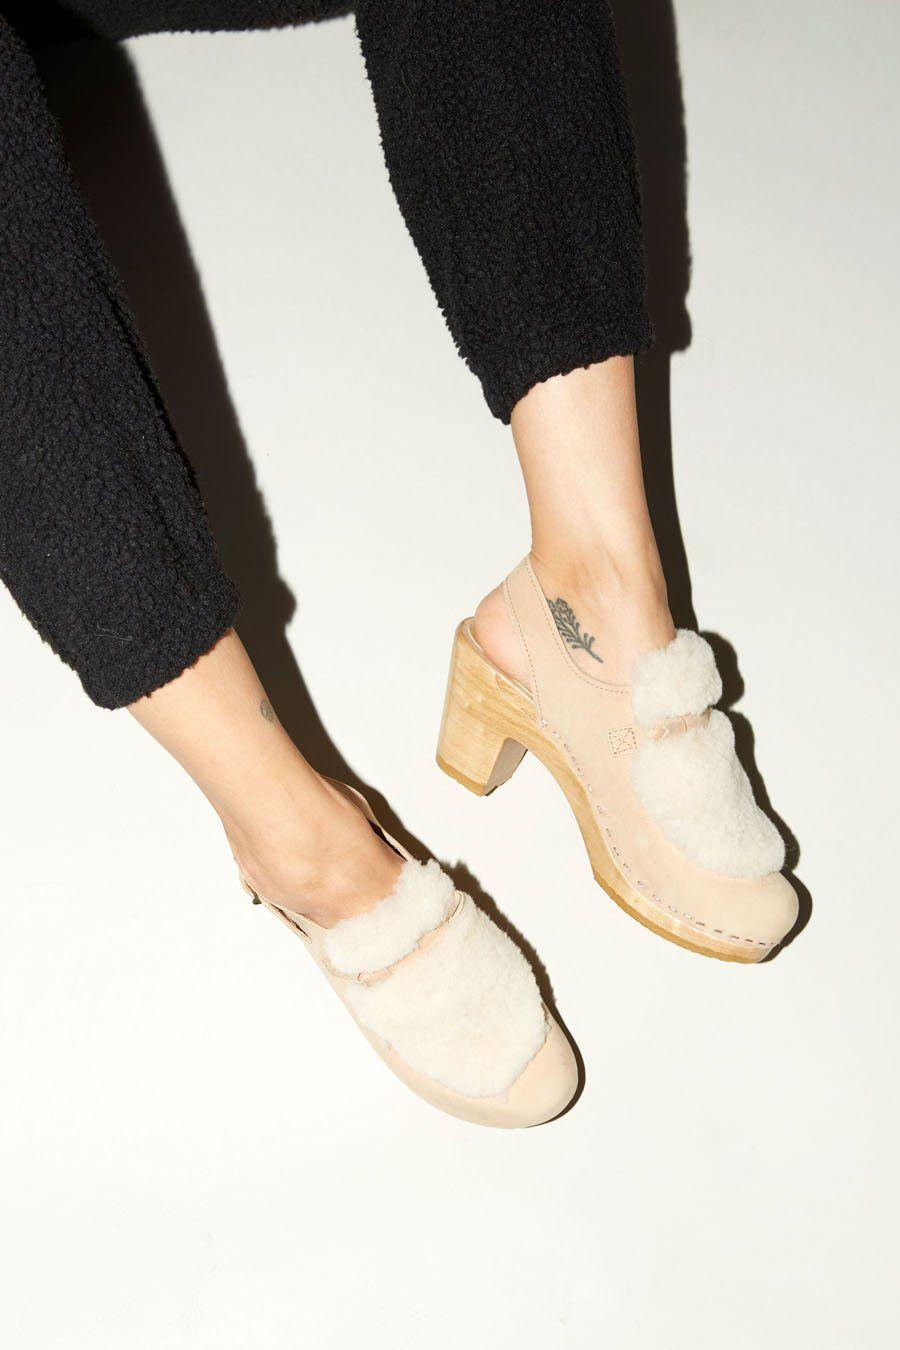 fb8f0b6435259 No.6 Fur Slingback Clog on High Heel in Bone/Cream   Products ...